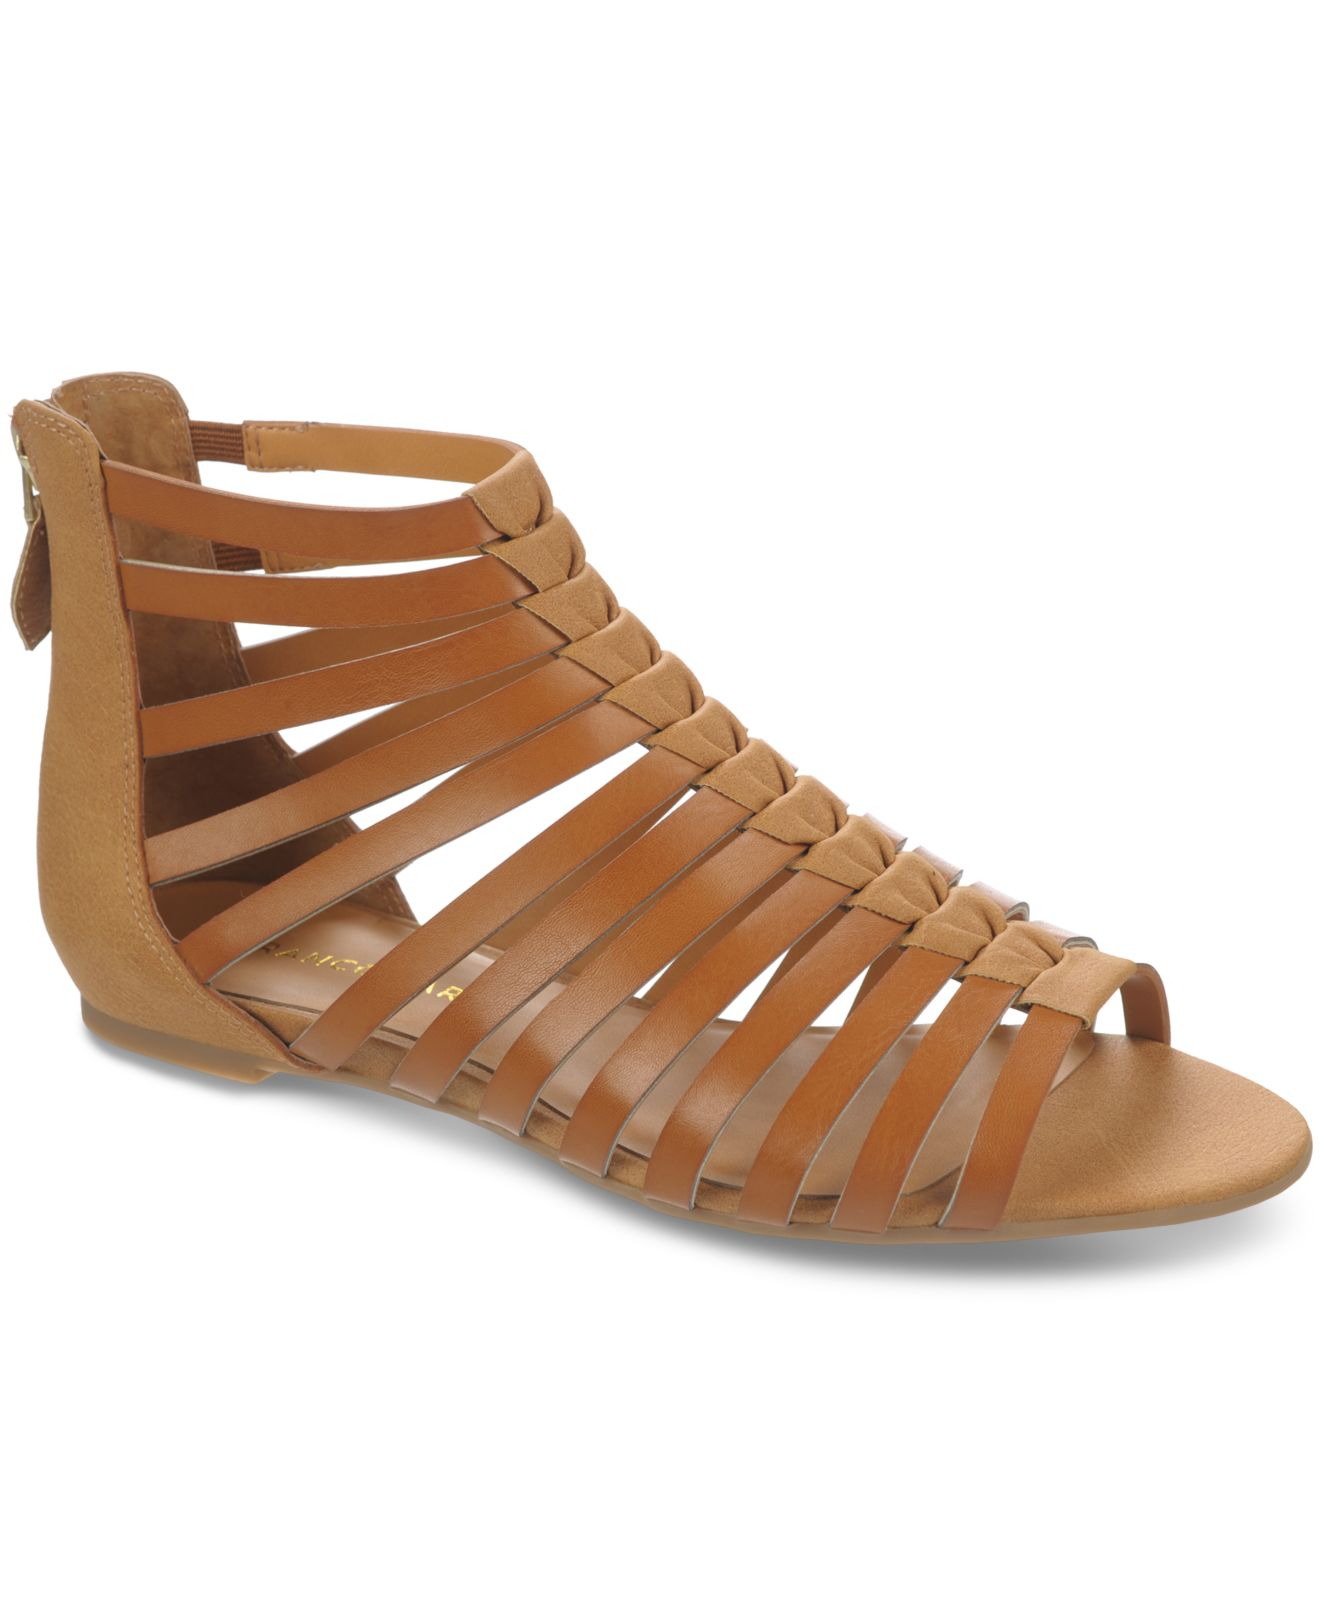 c2b7ba93235a Lyst - Franco Sarto Atrium Gladiator Sandals in Brown